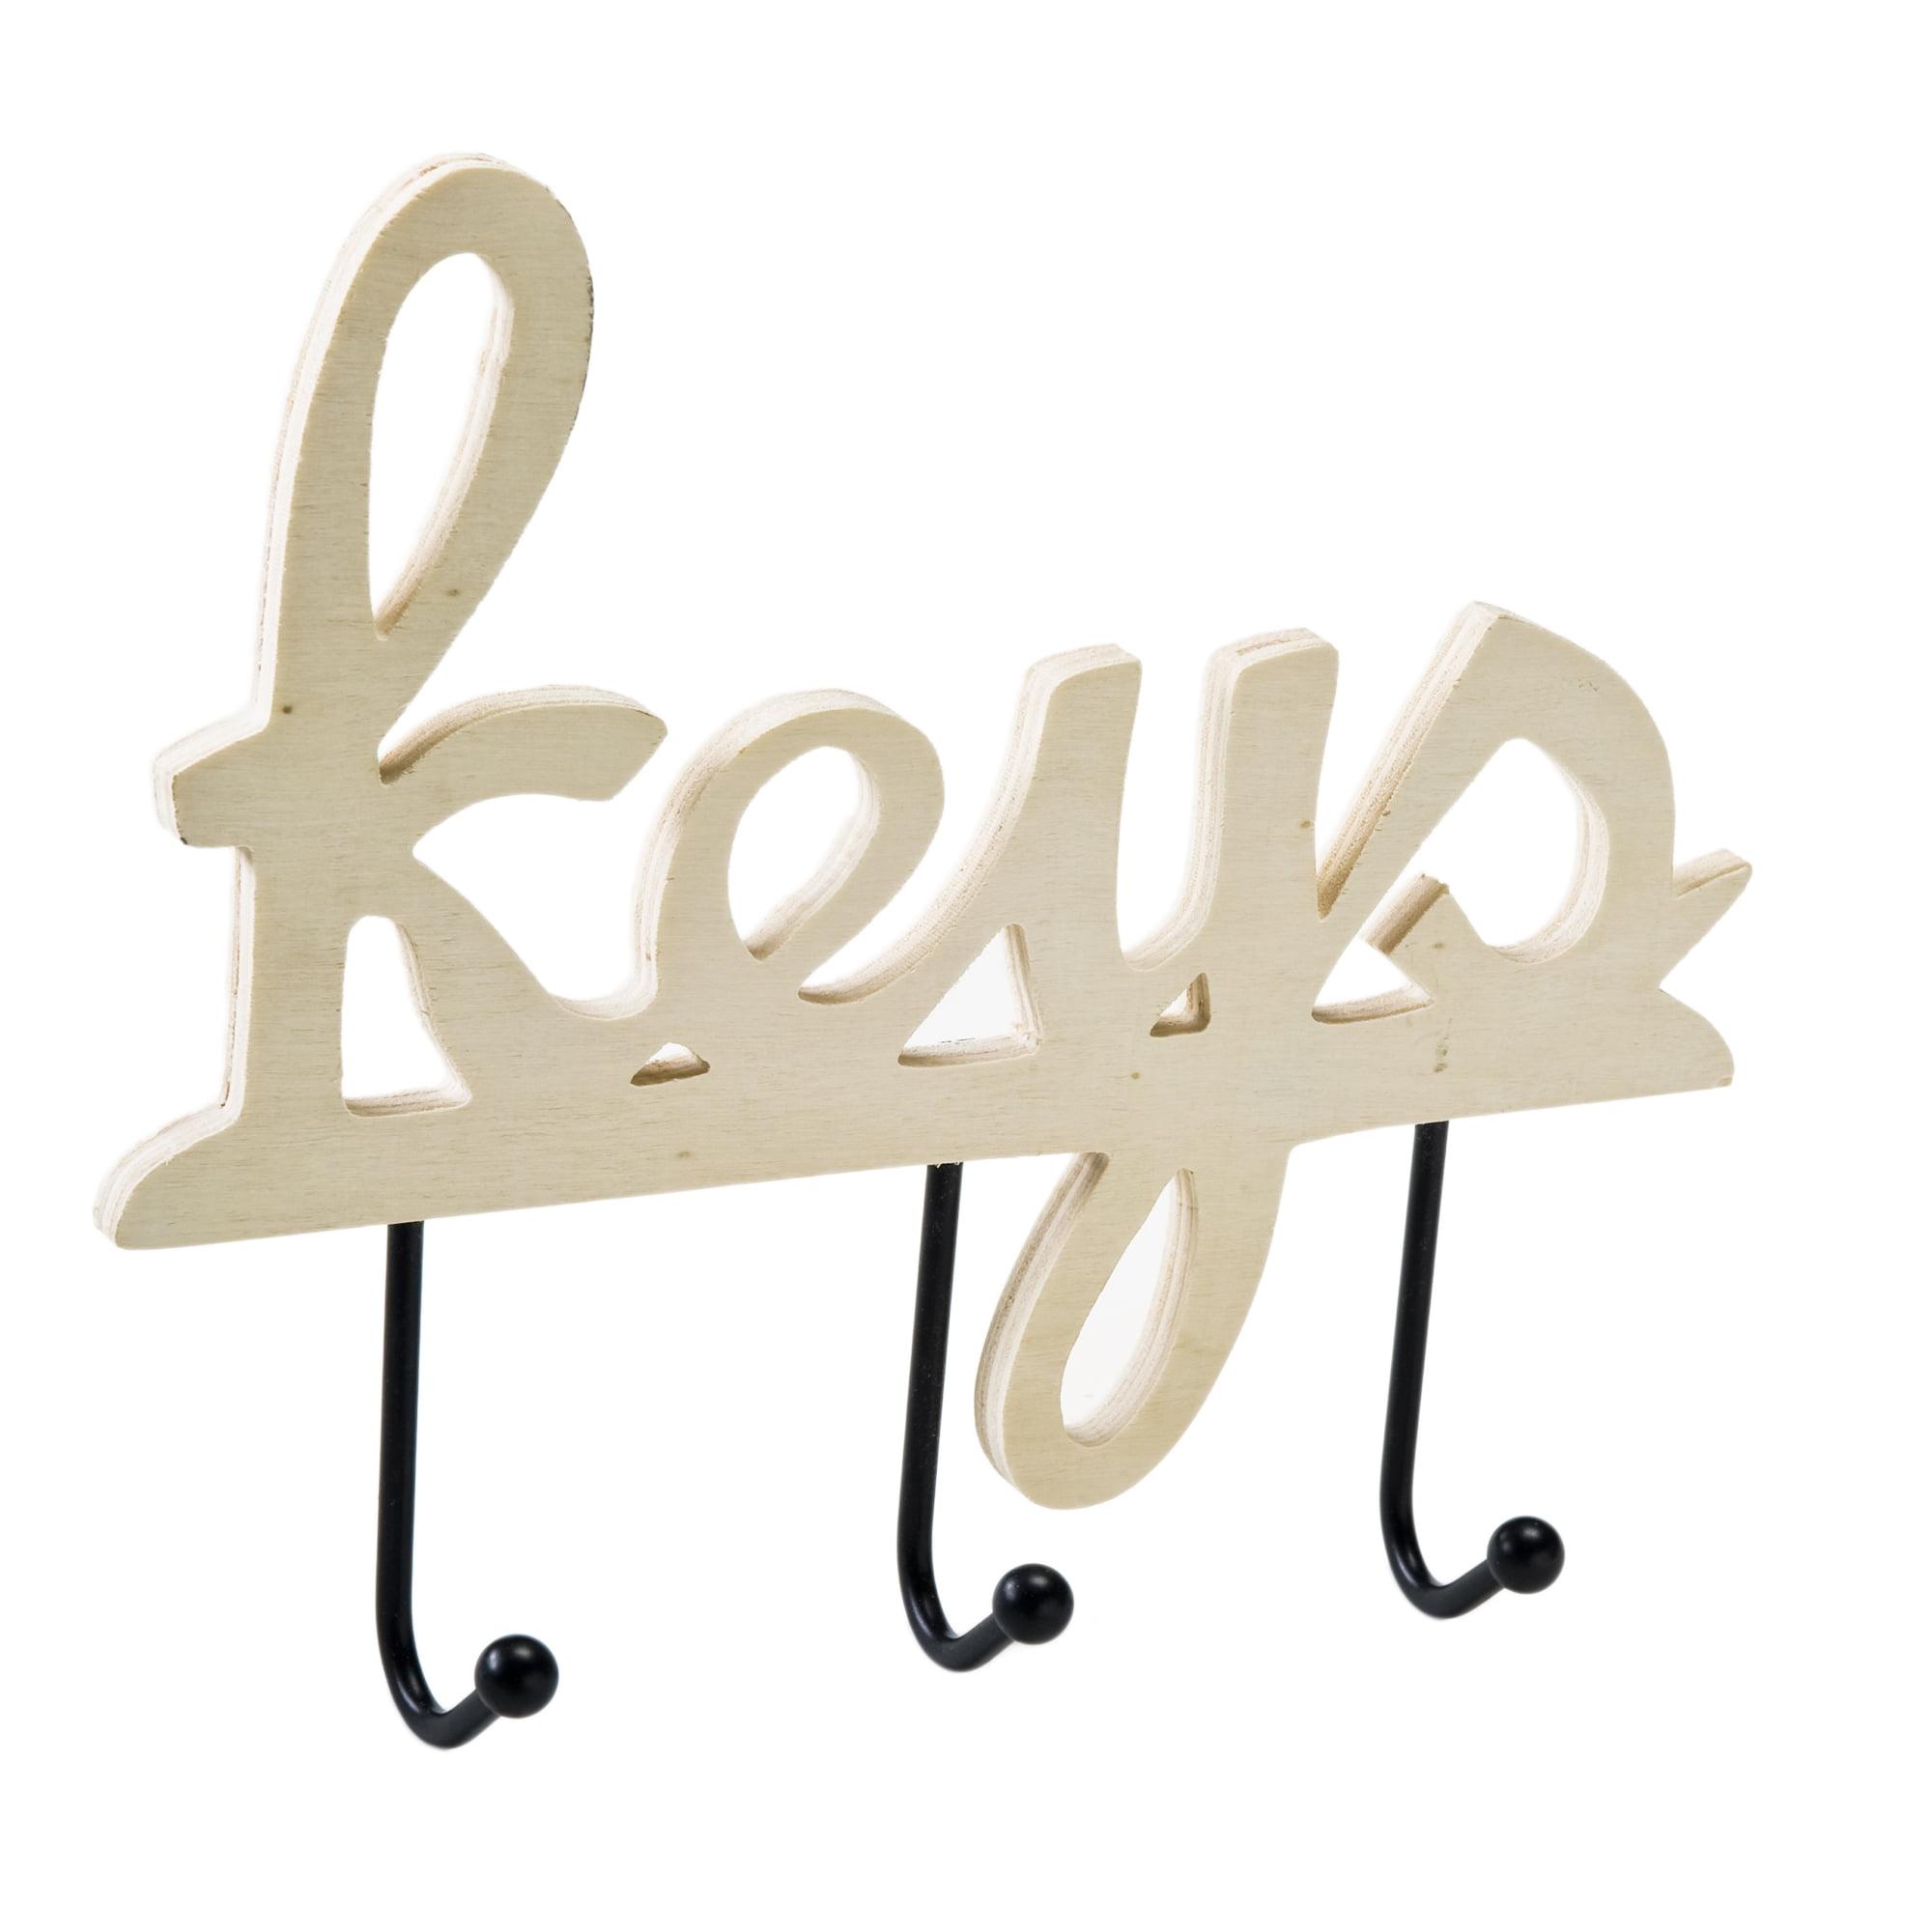 Plaid Wood Plaque, Key Holder